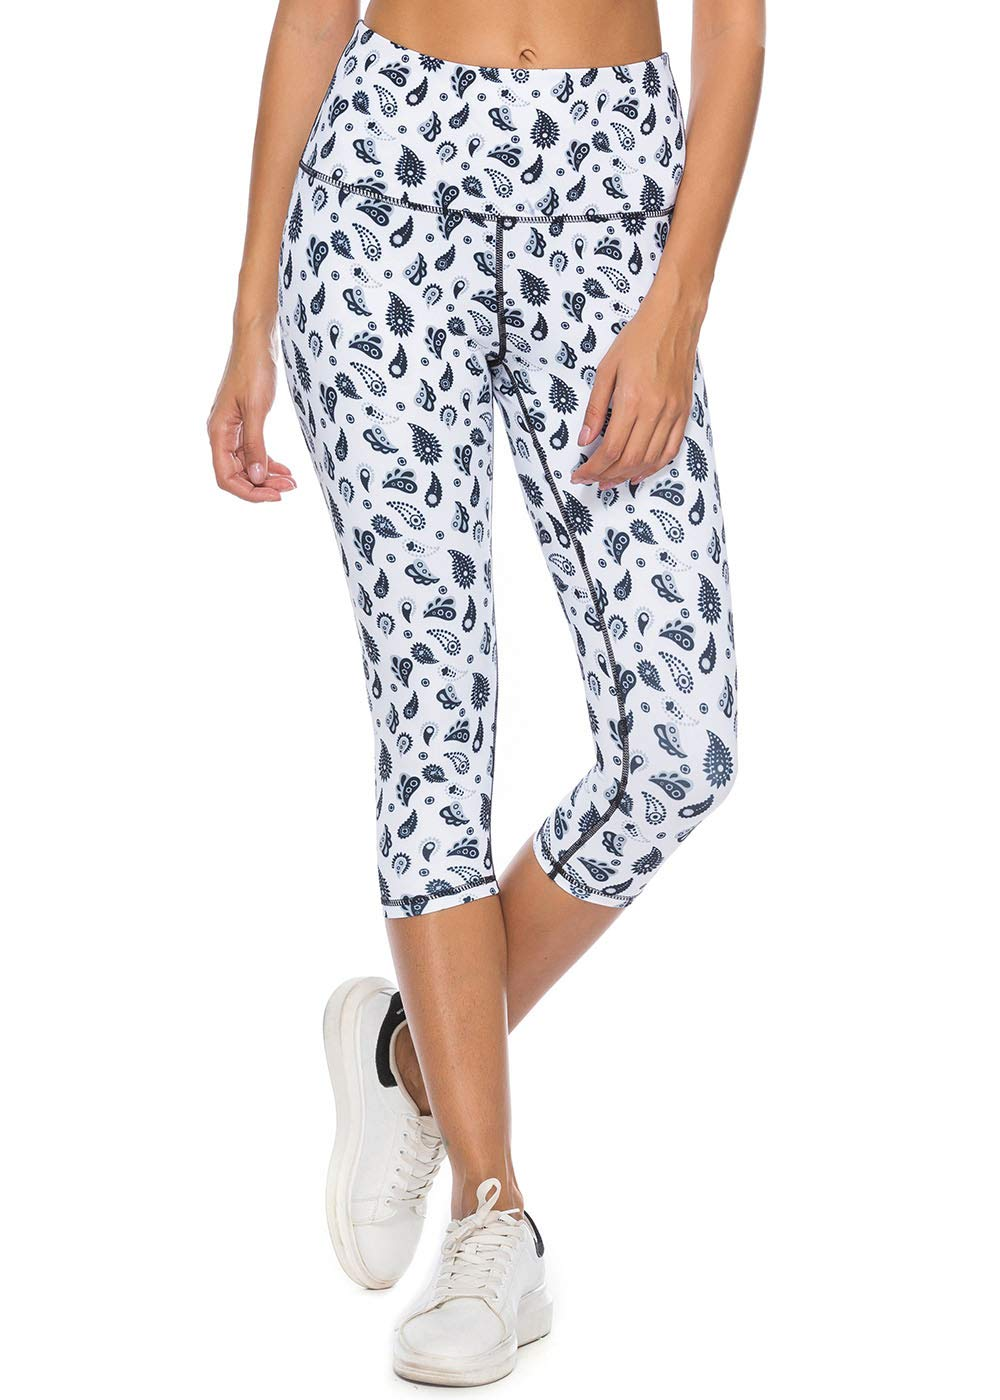 Mint Lilac Women's High Waist Workout Printed Yoga Leggings Athletic Capri Tummy Control Running Pants Small